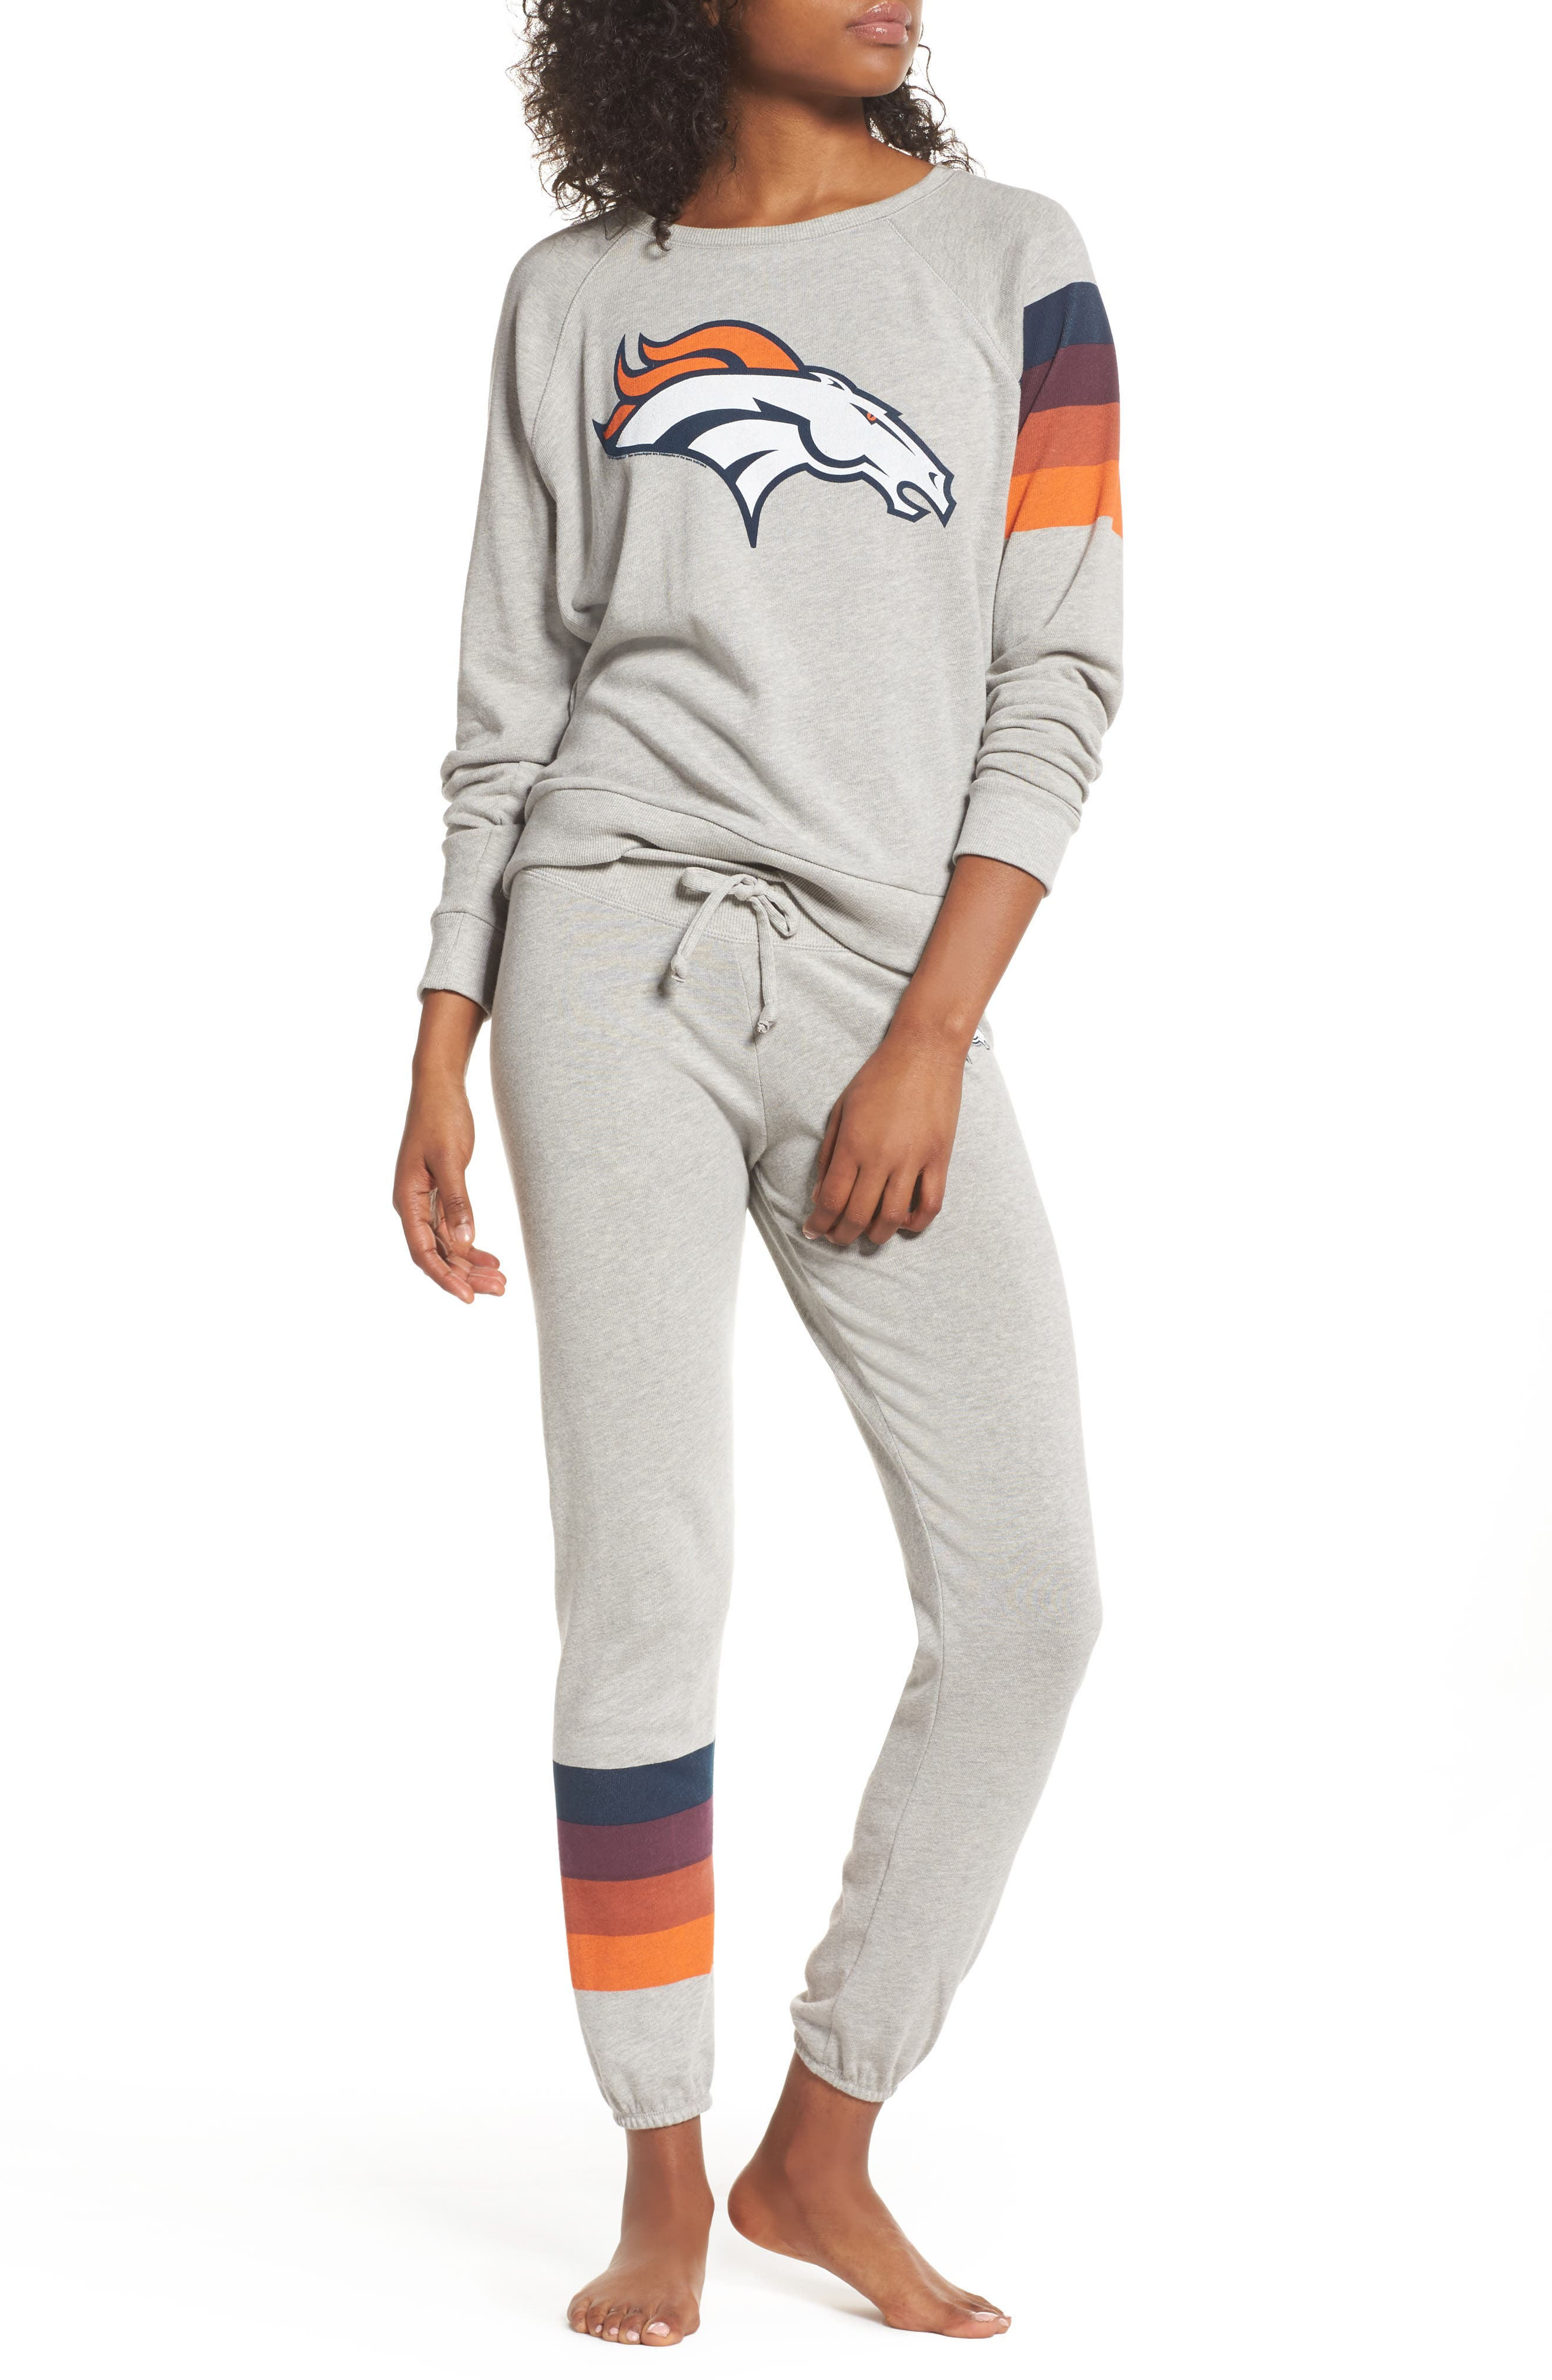 NFL Denver Broncos Hacci Sweatshirt,                             Alternate thumbnail 6, color,                             Dove Heather Grey